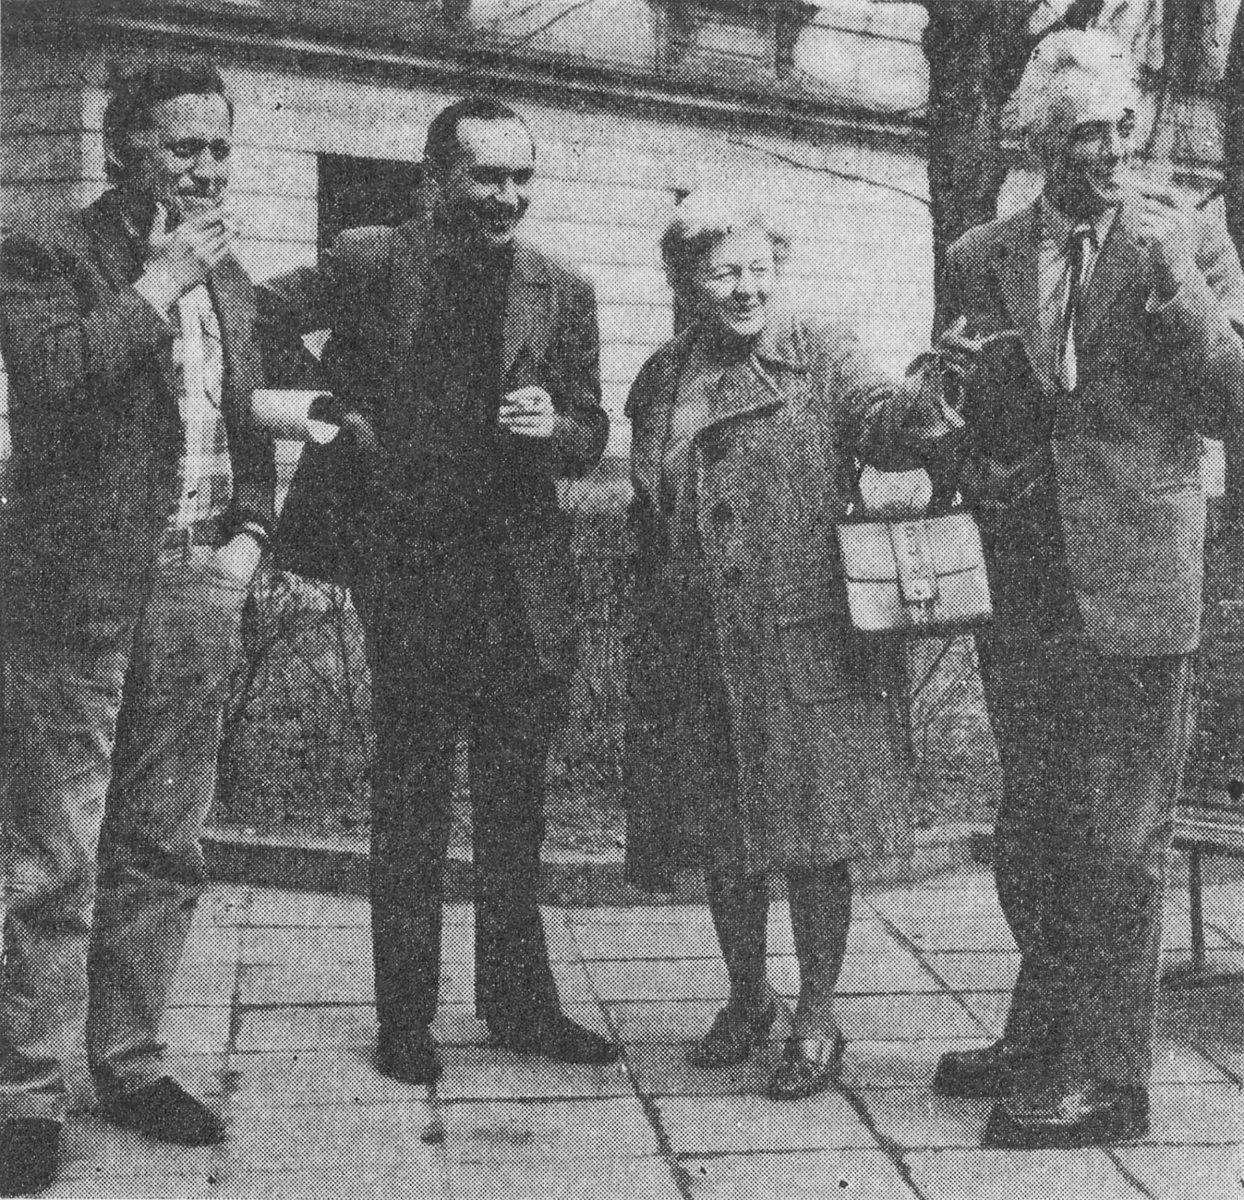 Designers of the Embassy in Pyongyang – from the left: Michał Gutt, Wiesław Nowak, Alina Scholtz, Tadeusz Zieliński photo N.N. Architektura 1971, no. 8, p. 314 National Library, file no. P.23099 II egz. copyright - public domain